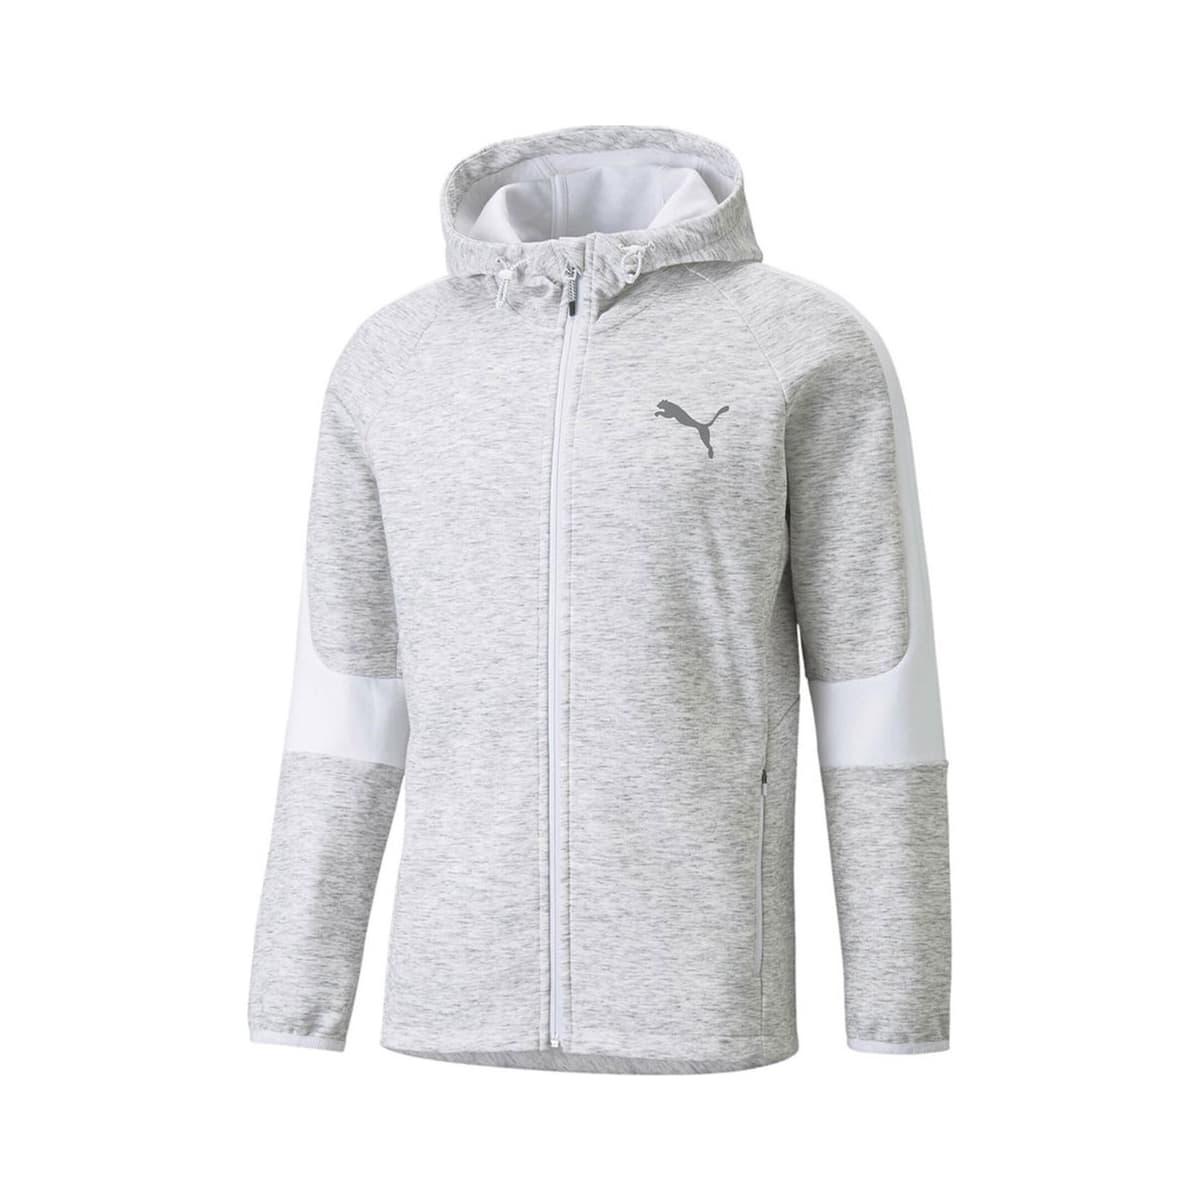 Evostripe Fermuarlı Kapüşonlu Erkek Beyaz Sweatshirt (589424-02)